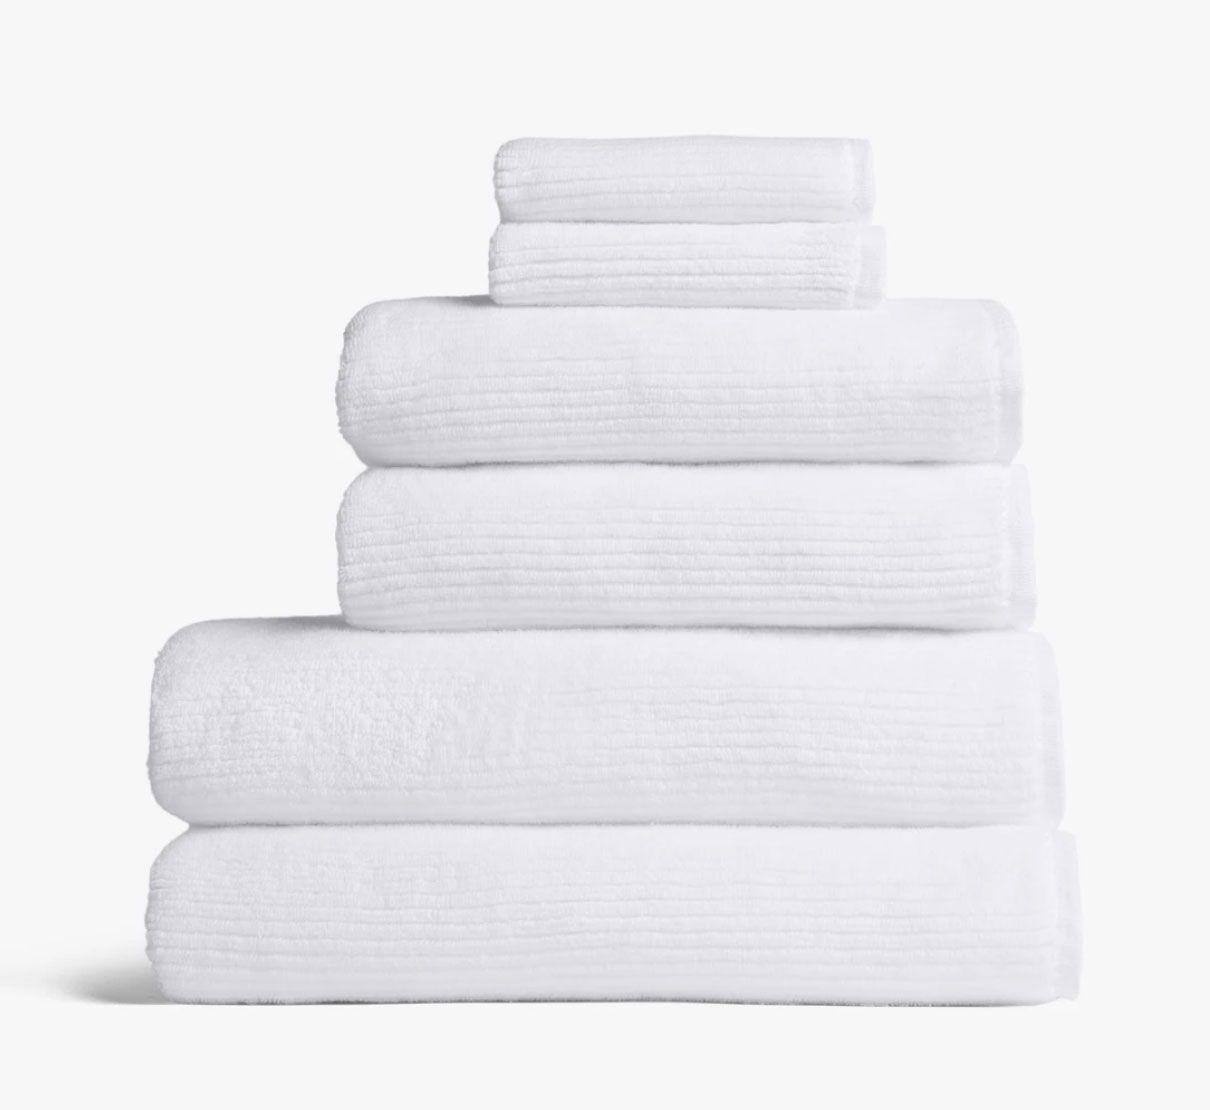 Parachute Soft Rib Towels